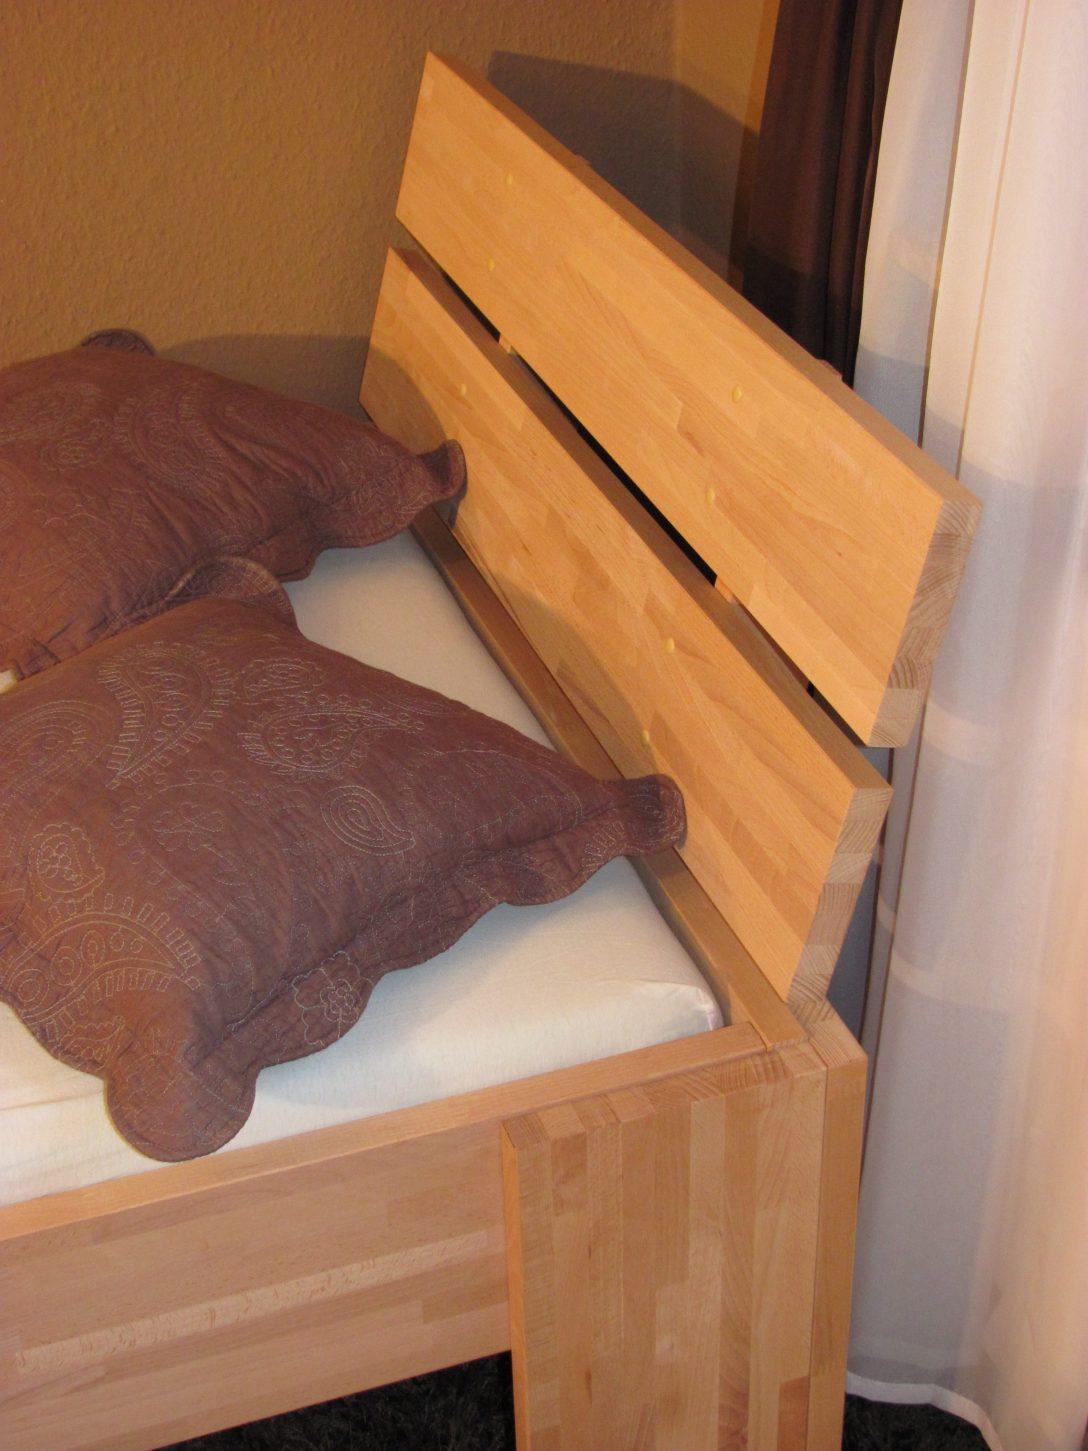 Large Size of Massivholz Bett 27mm Massivholzbett Einzelbett Doppelbett Mit Fuss I Betten 140x200 Metall Ausgefallene Inkontinenzeinlagen 180x200 Lattenrost Und Matratze Bett Massivholz Bett